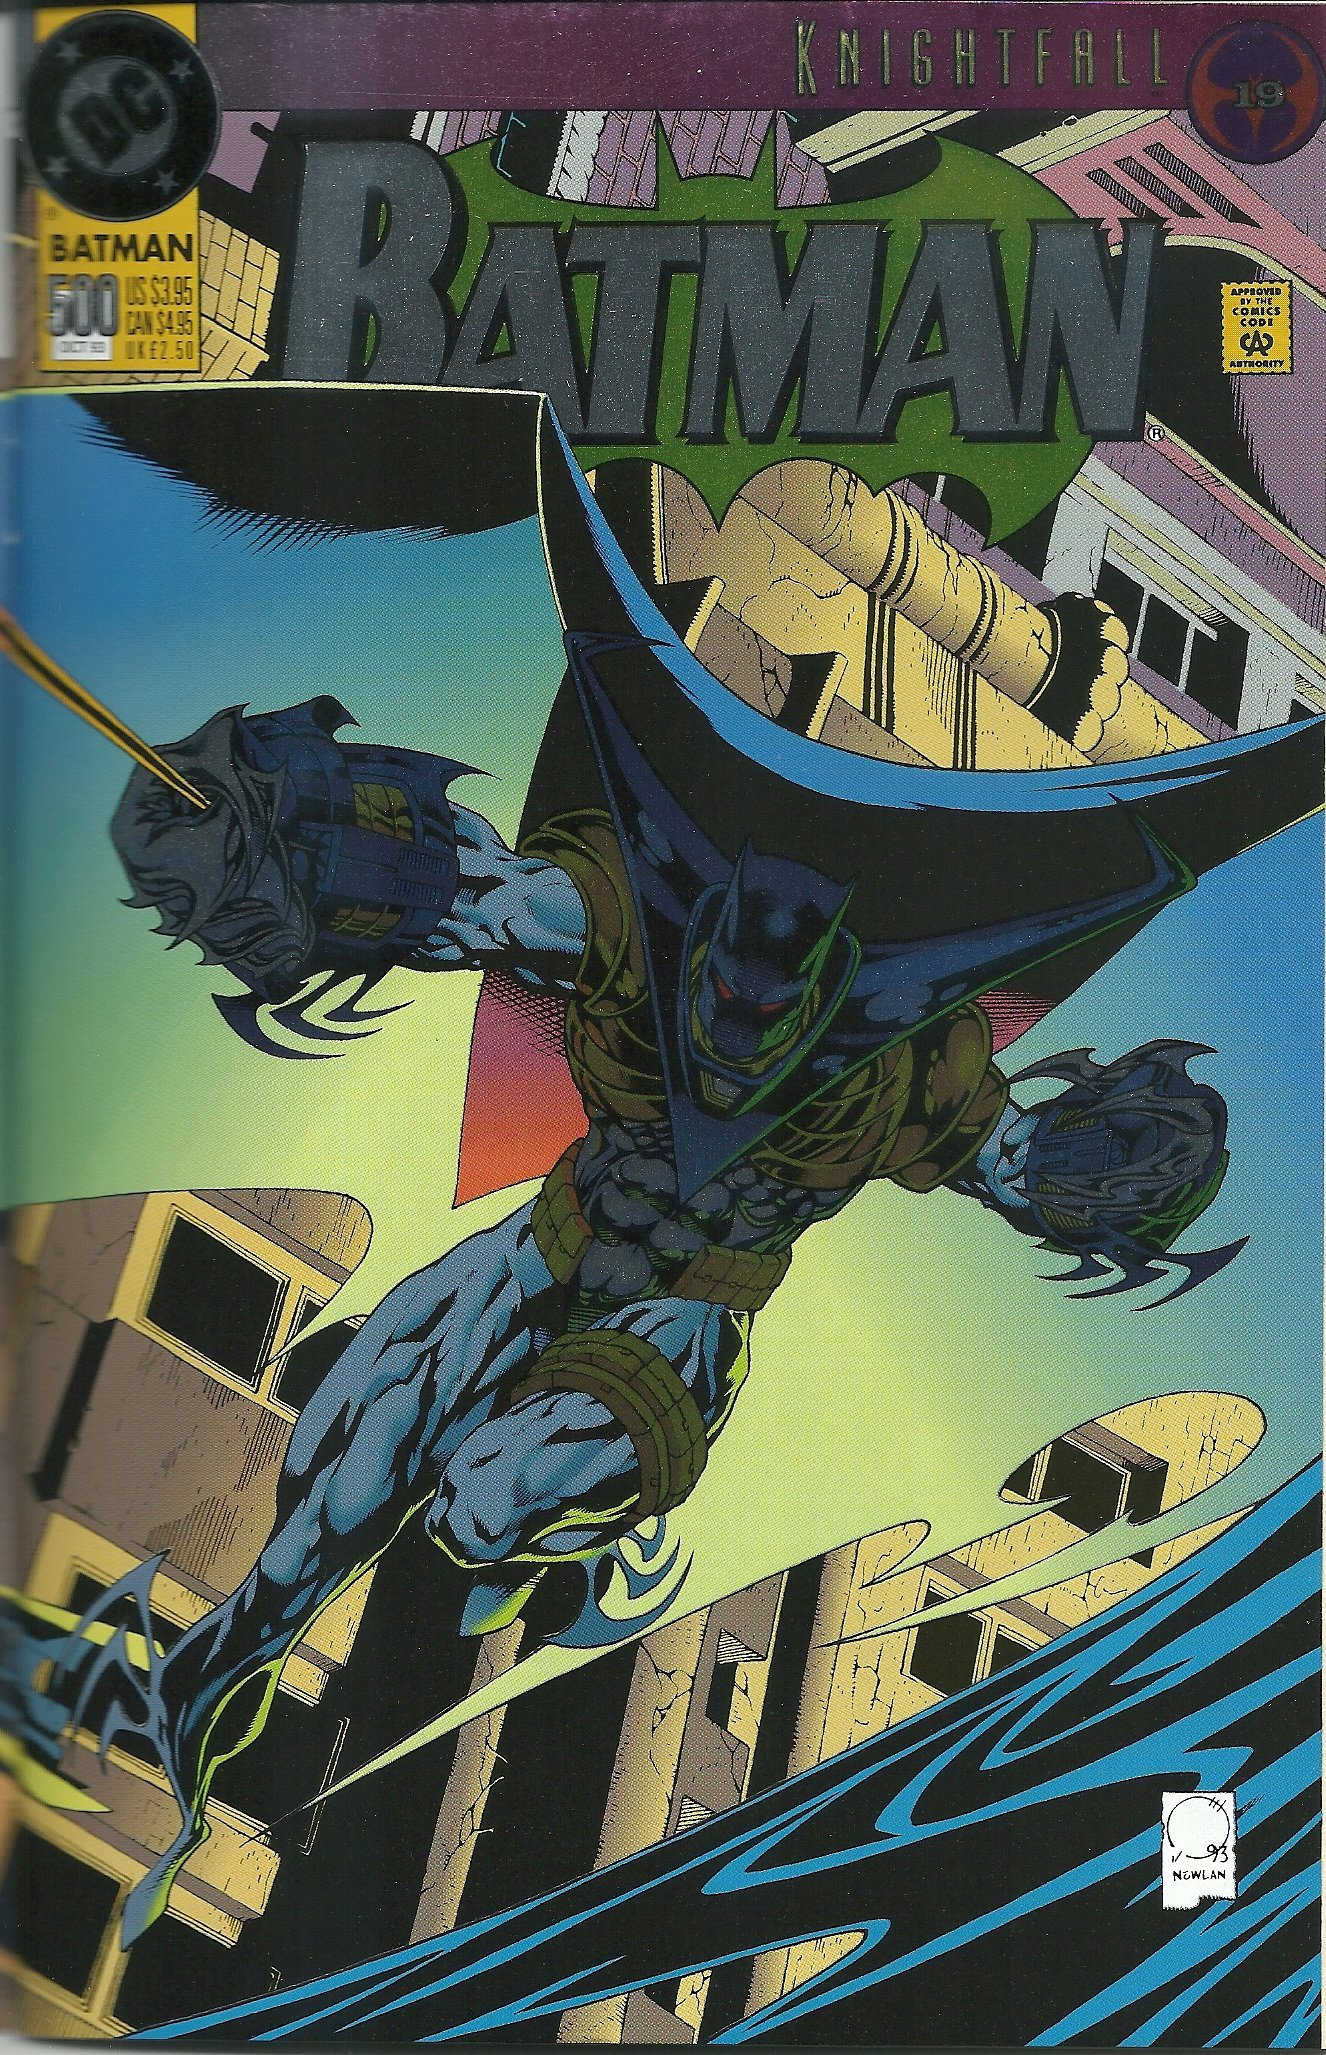 Batman Number 15 Knightfall 15 15 Jim Aparo, Mike Manley, Doug ...